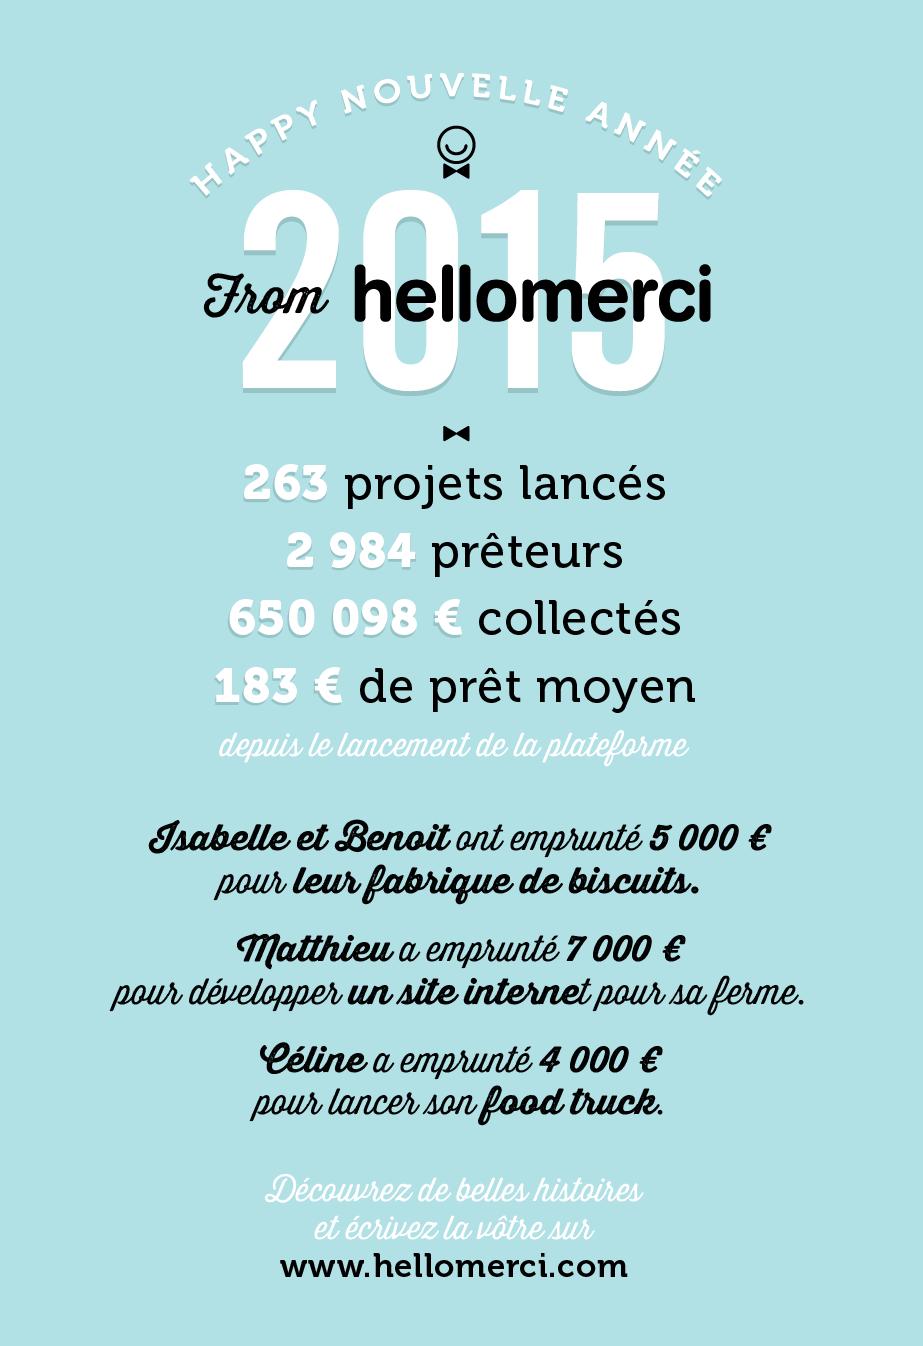 Hellomerci-image